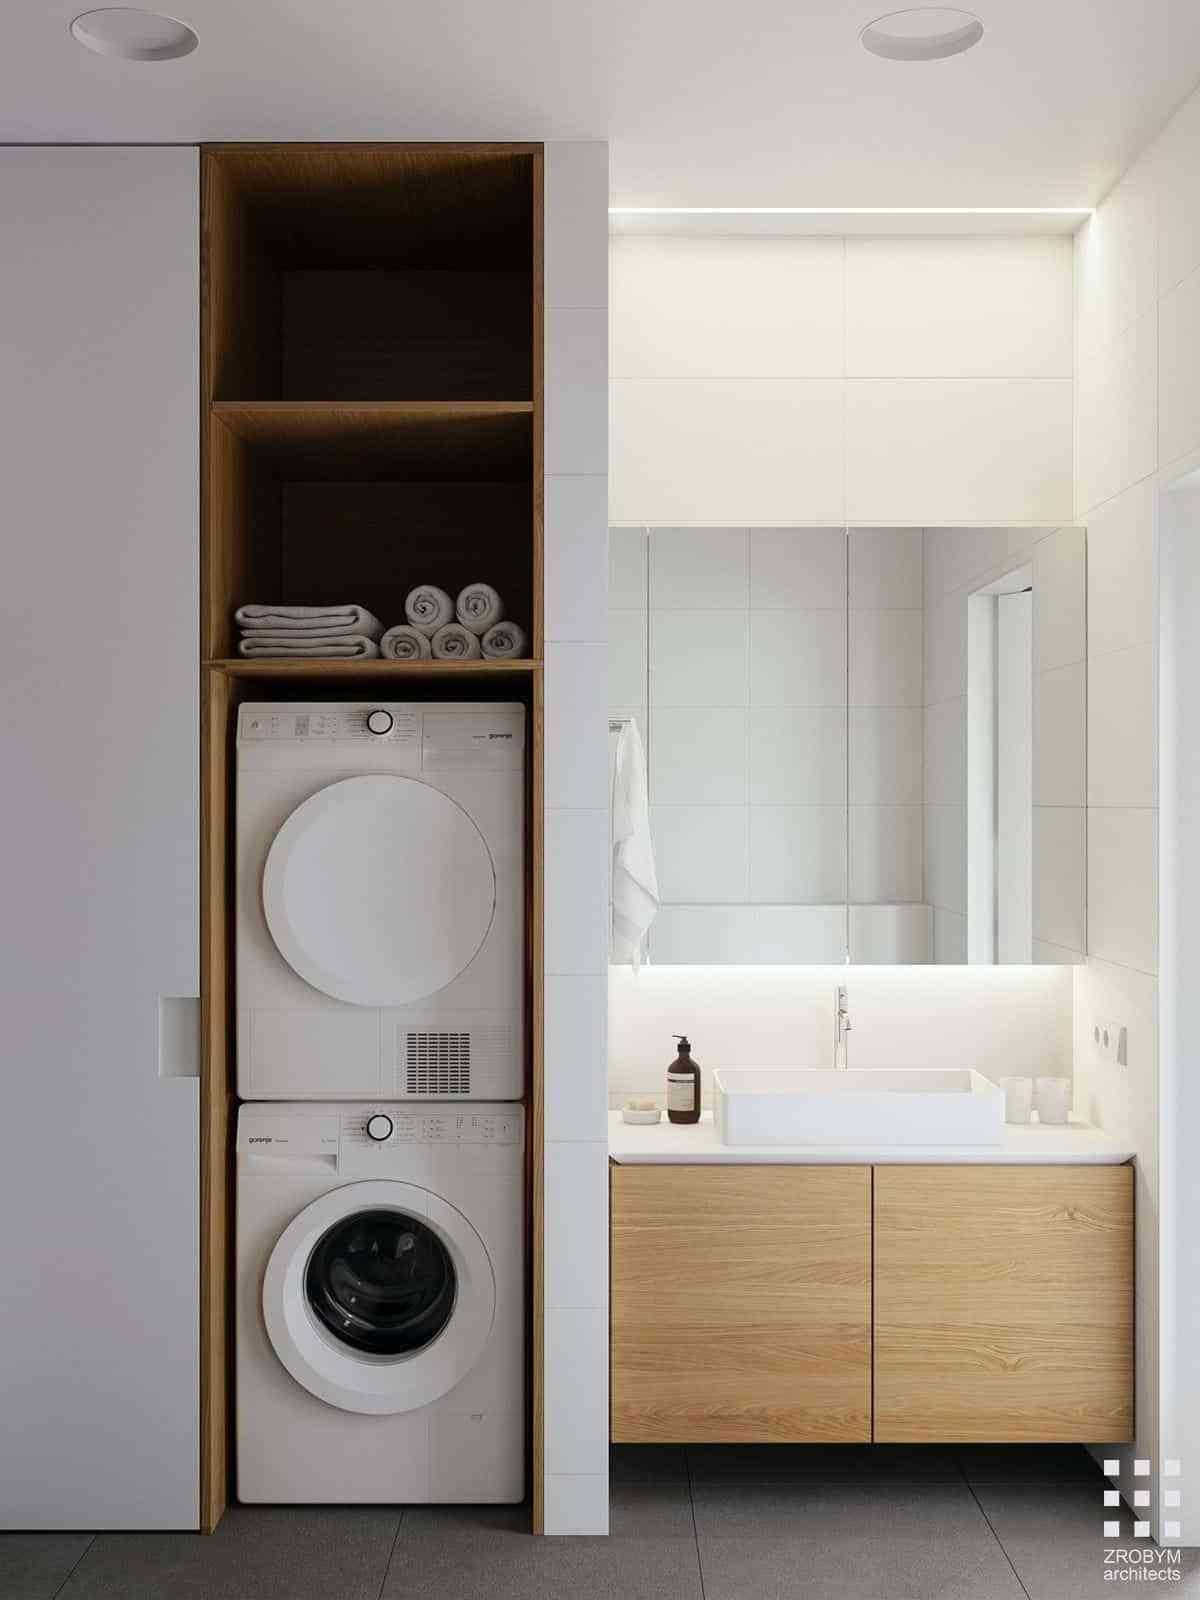 lavadora en el bano IX